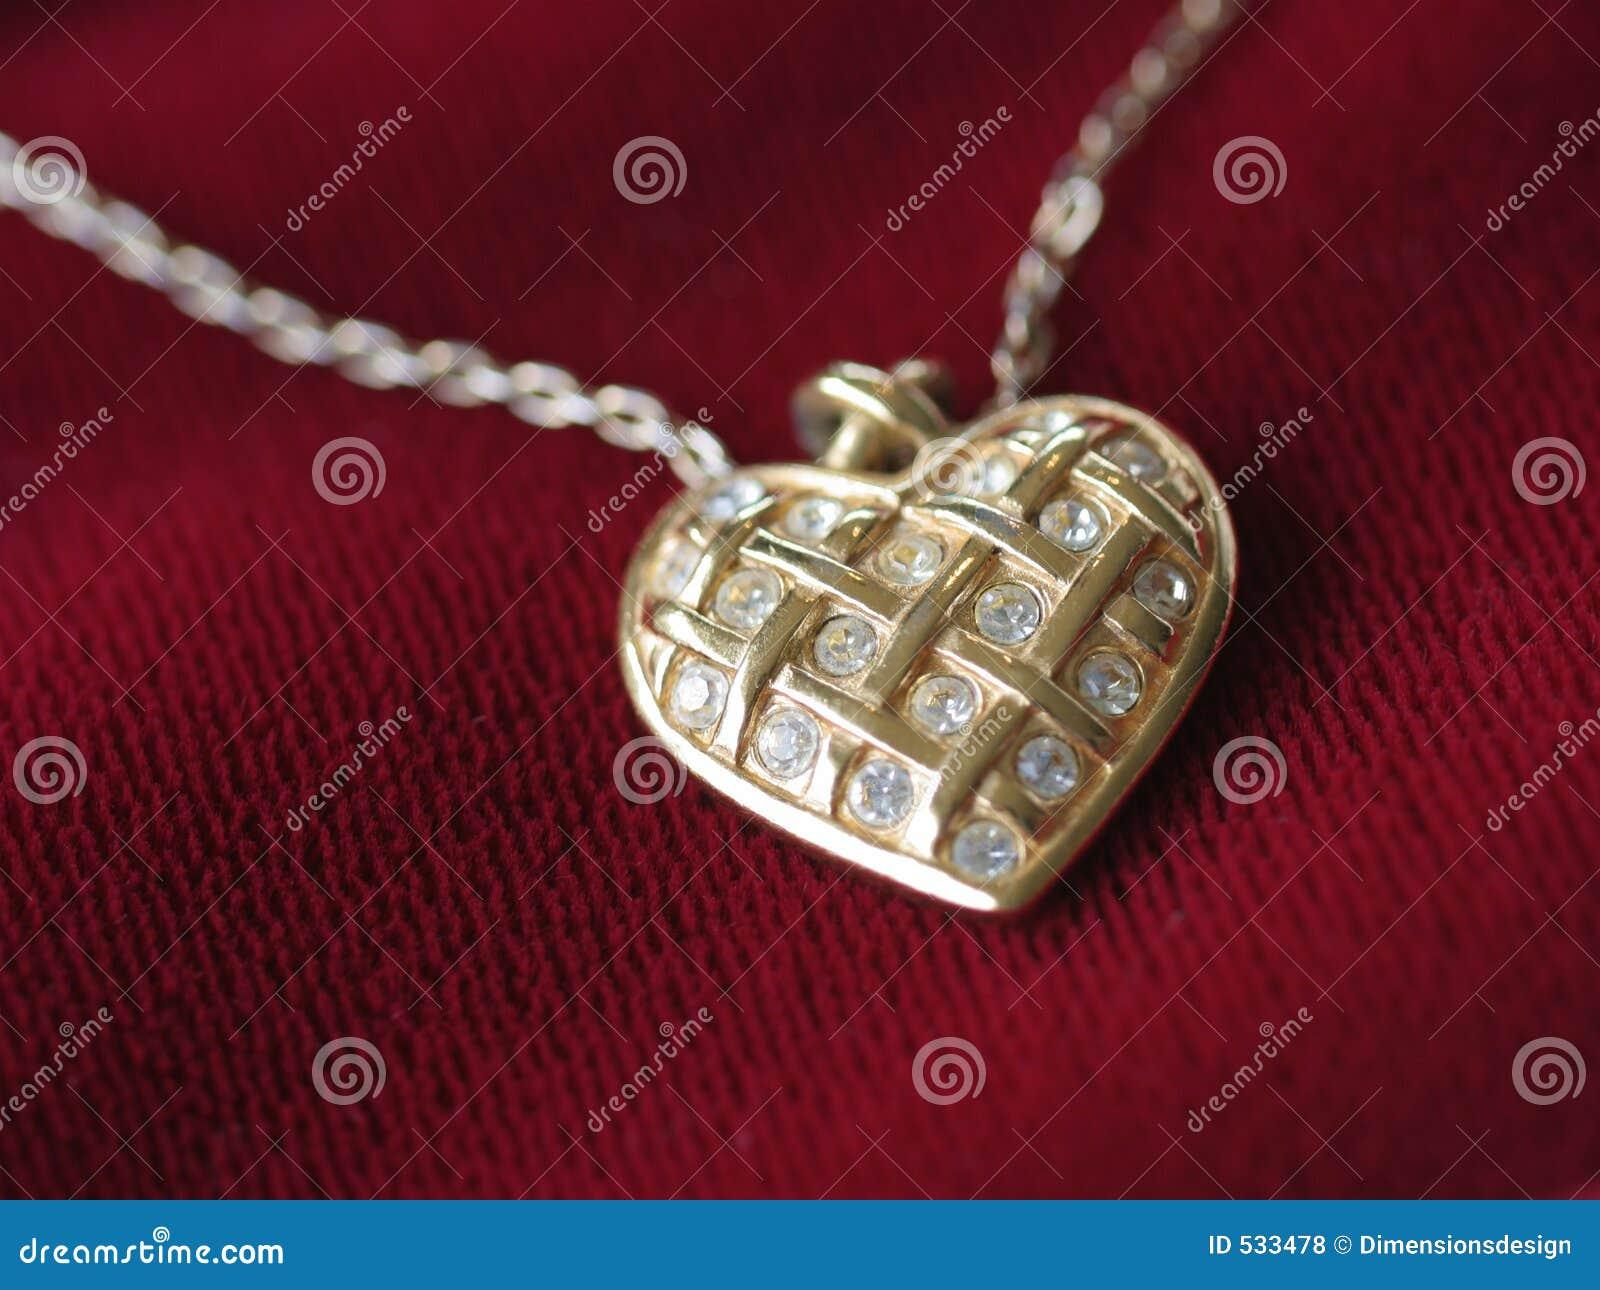 Download 重点项链红色 库存照片. 图片 包括有 伪造品, 金子, 妇女, 金刚石, 服装, 空白, 关闭, 脖子, 红色 - 533478